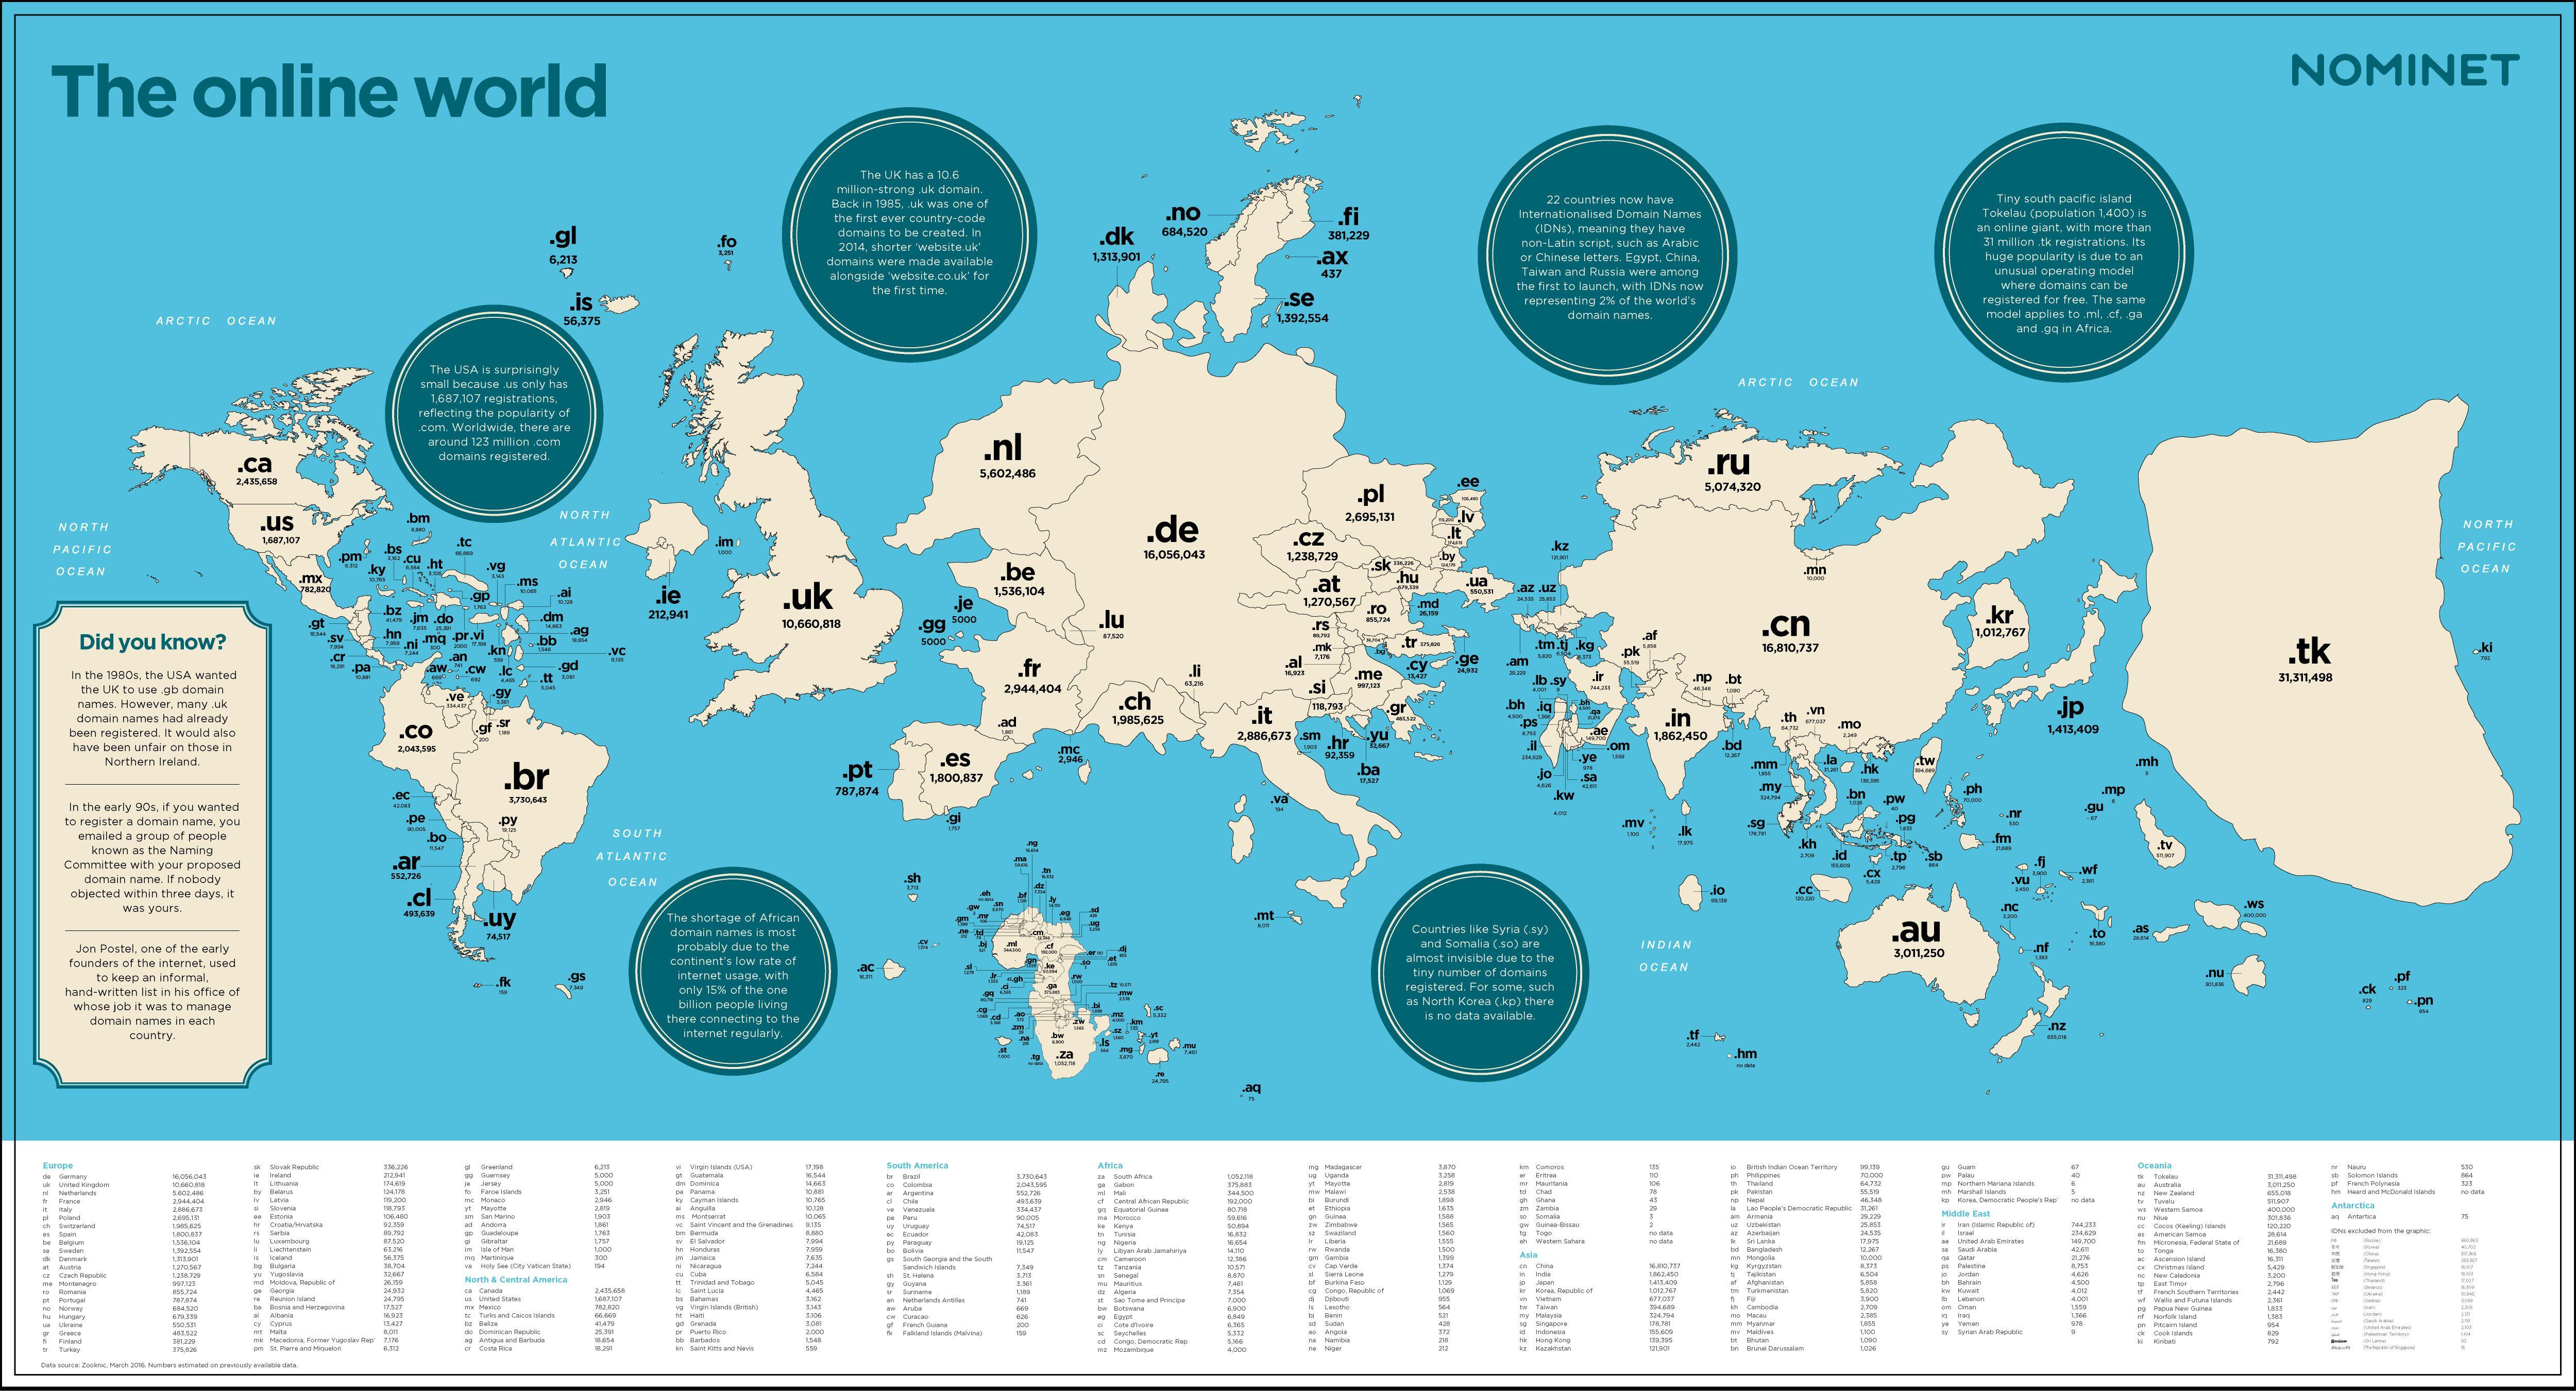 Tokelau the worlds one true online superpower gumiabroncs Choice Image